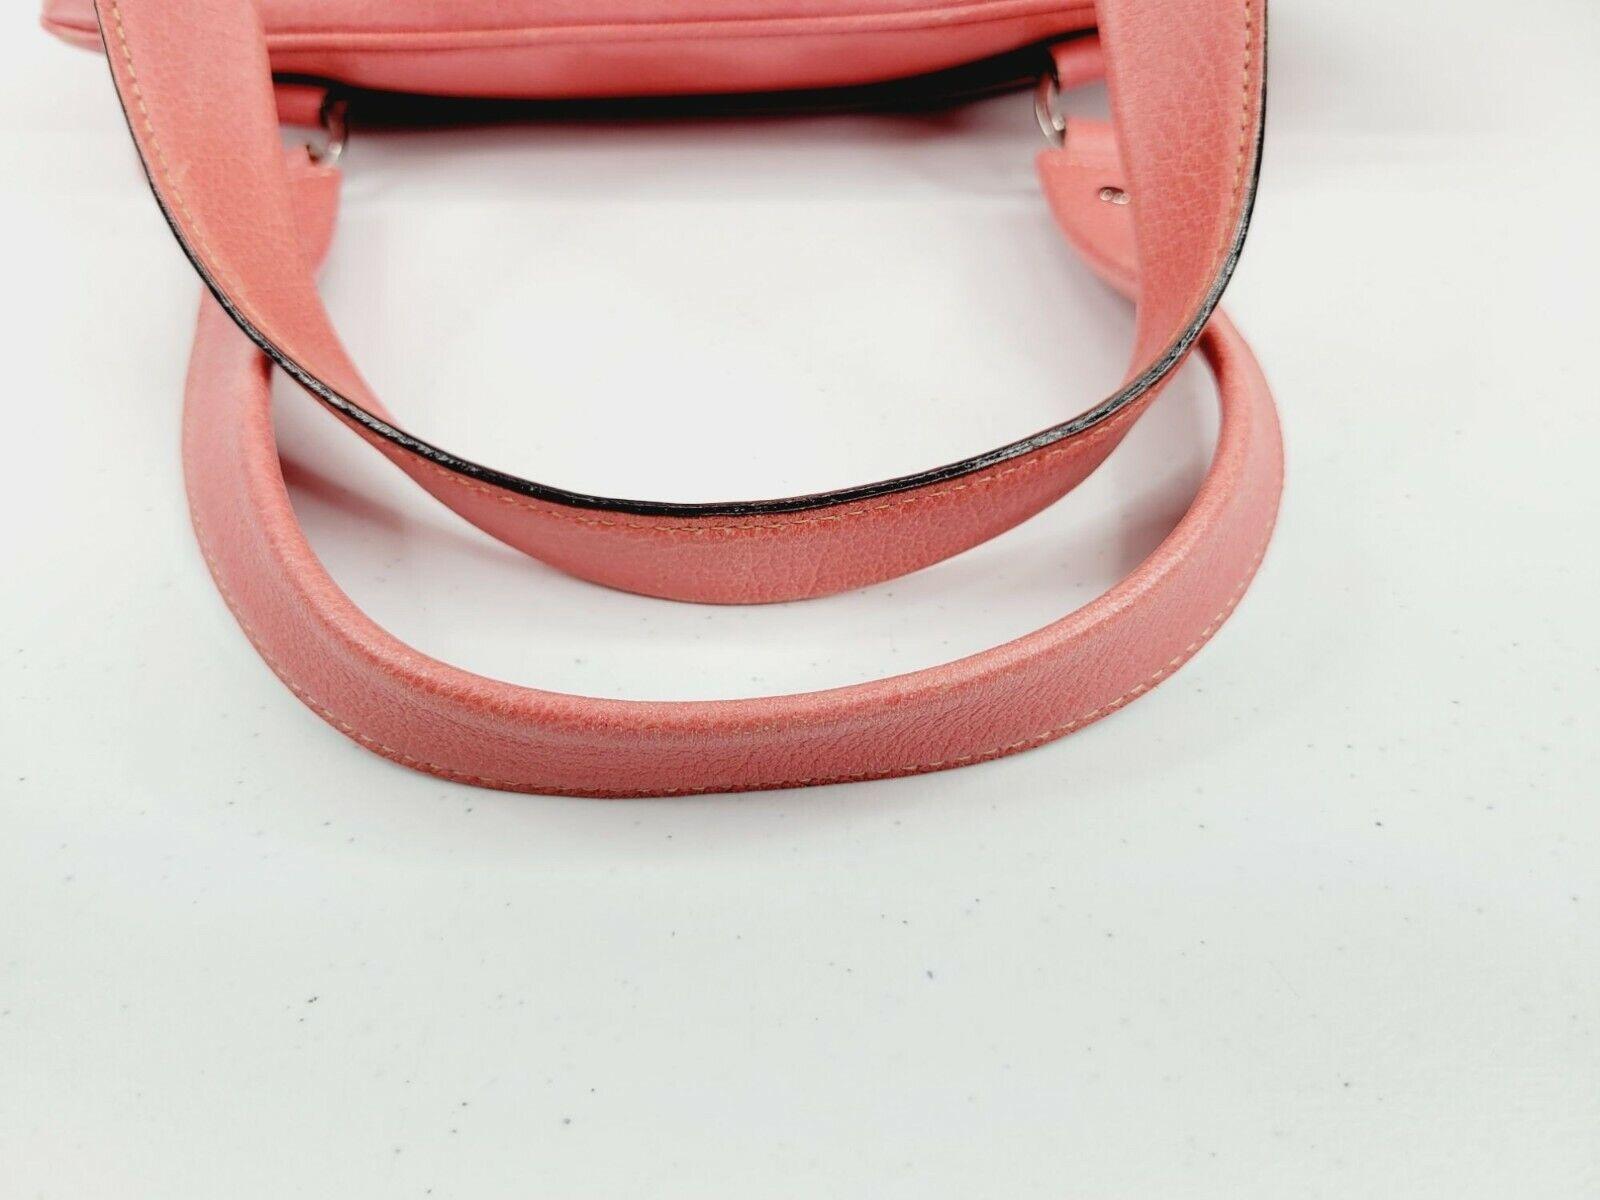 Kate Spade New York Bubblegum Pink Leather Satche… - image 7